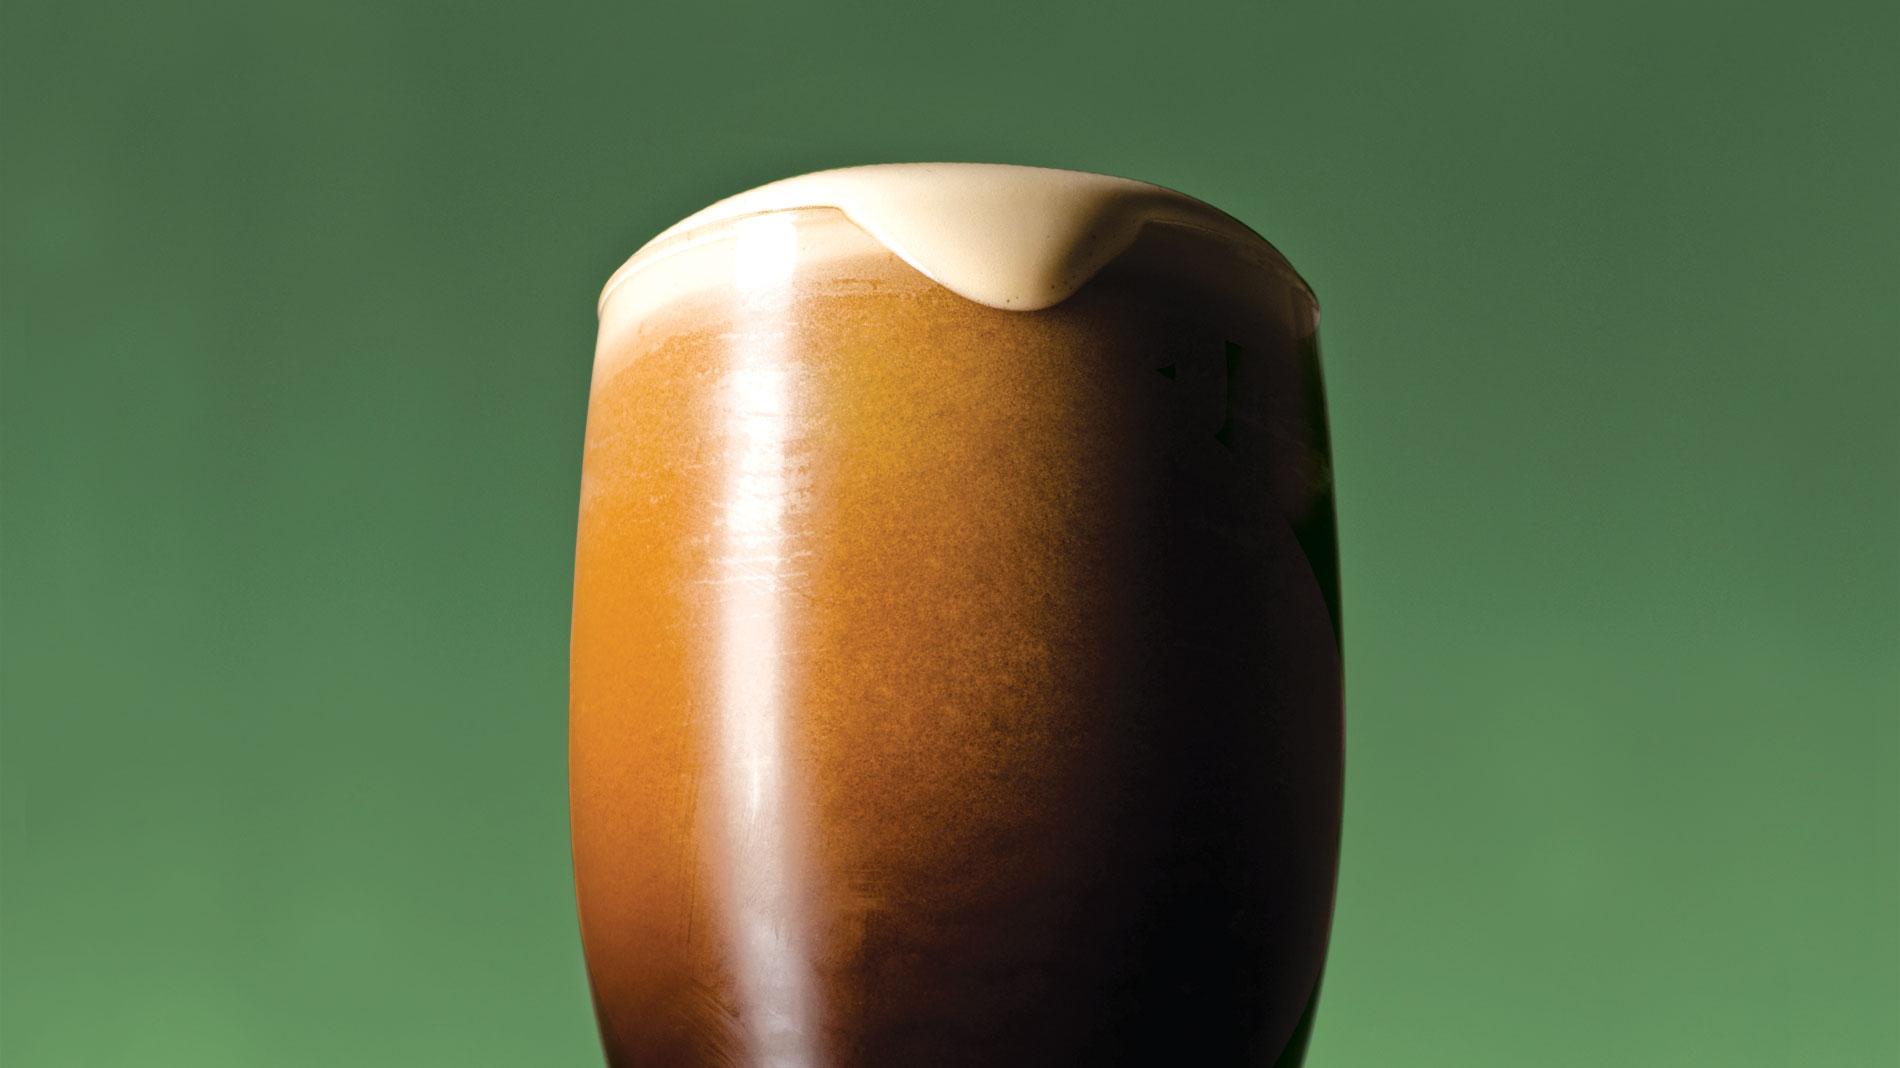 a nitro irish stout on a green background